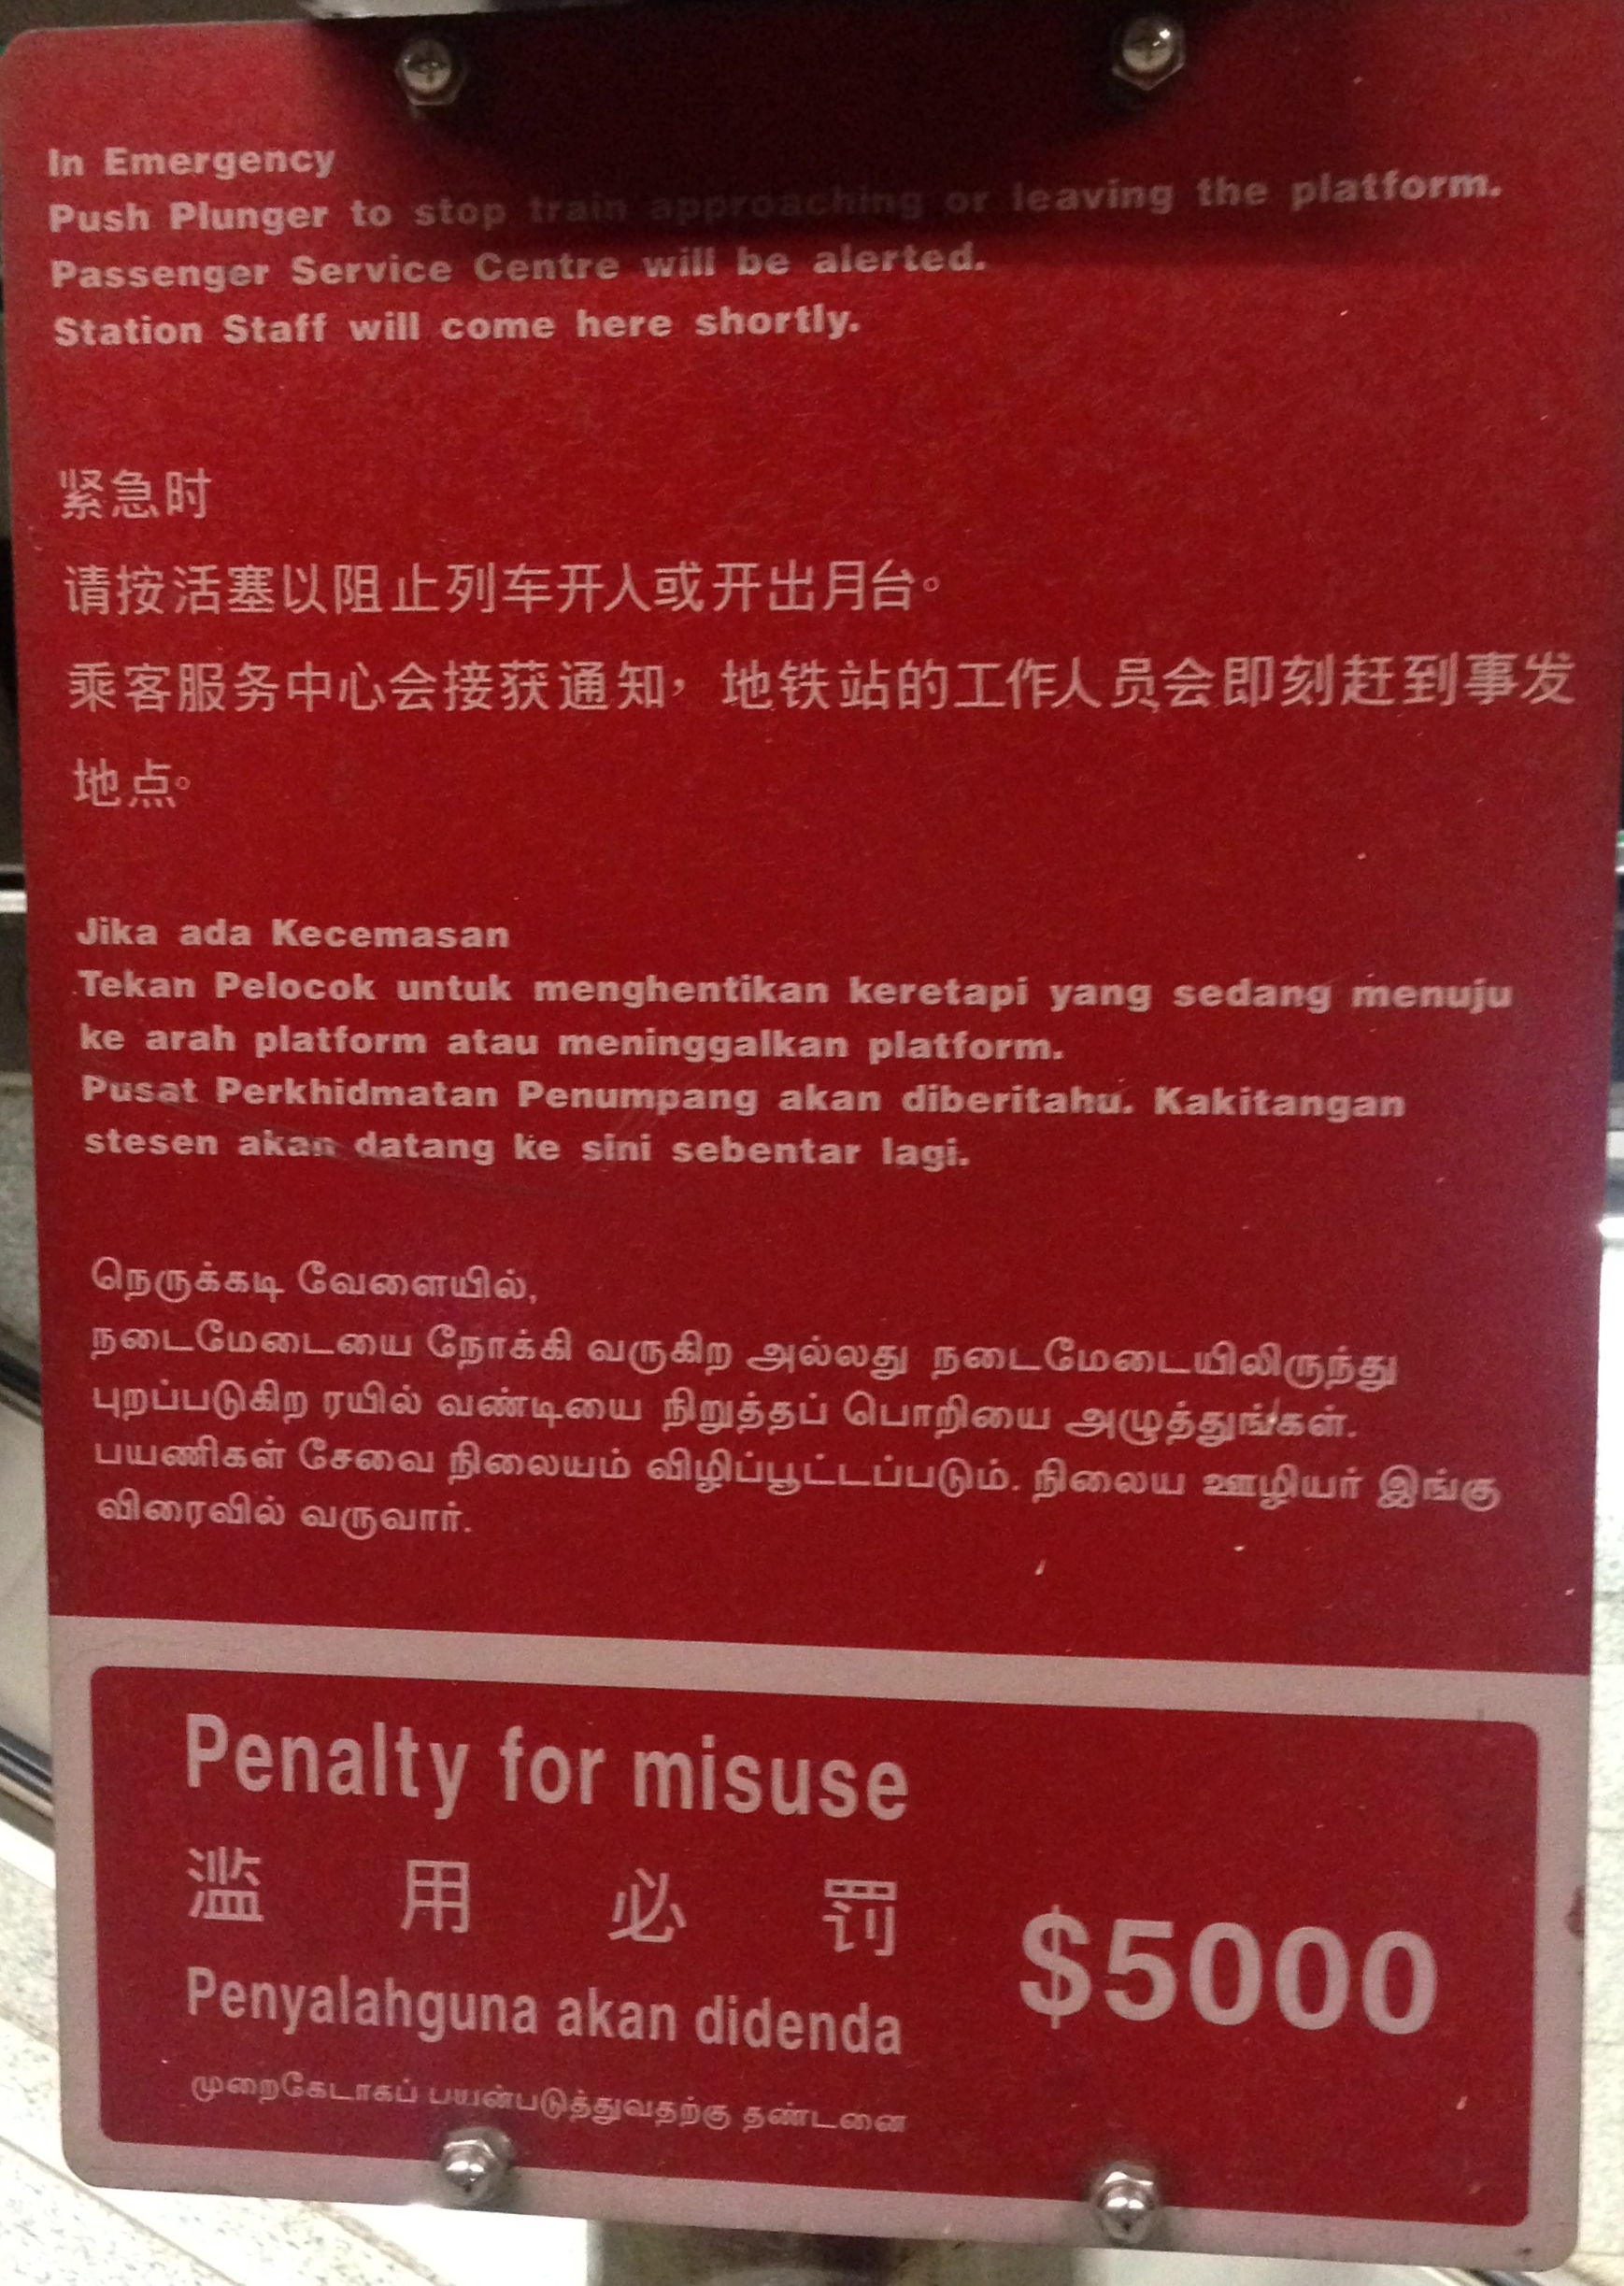 Bahasa Resmi Singapura : bahasa, resmi, singapura, Bahasa, Singapura, Wikipedia, Indonesia,, Ensiklopedia, Bebas